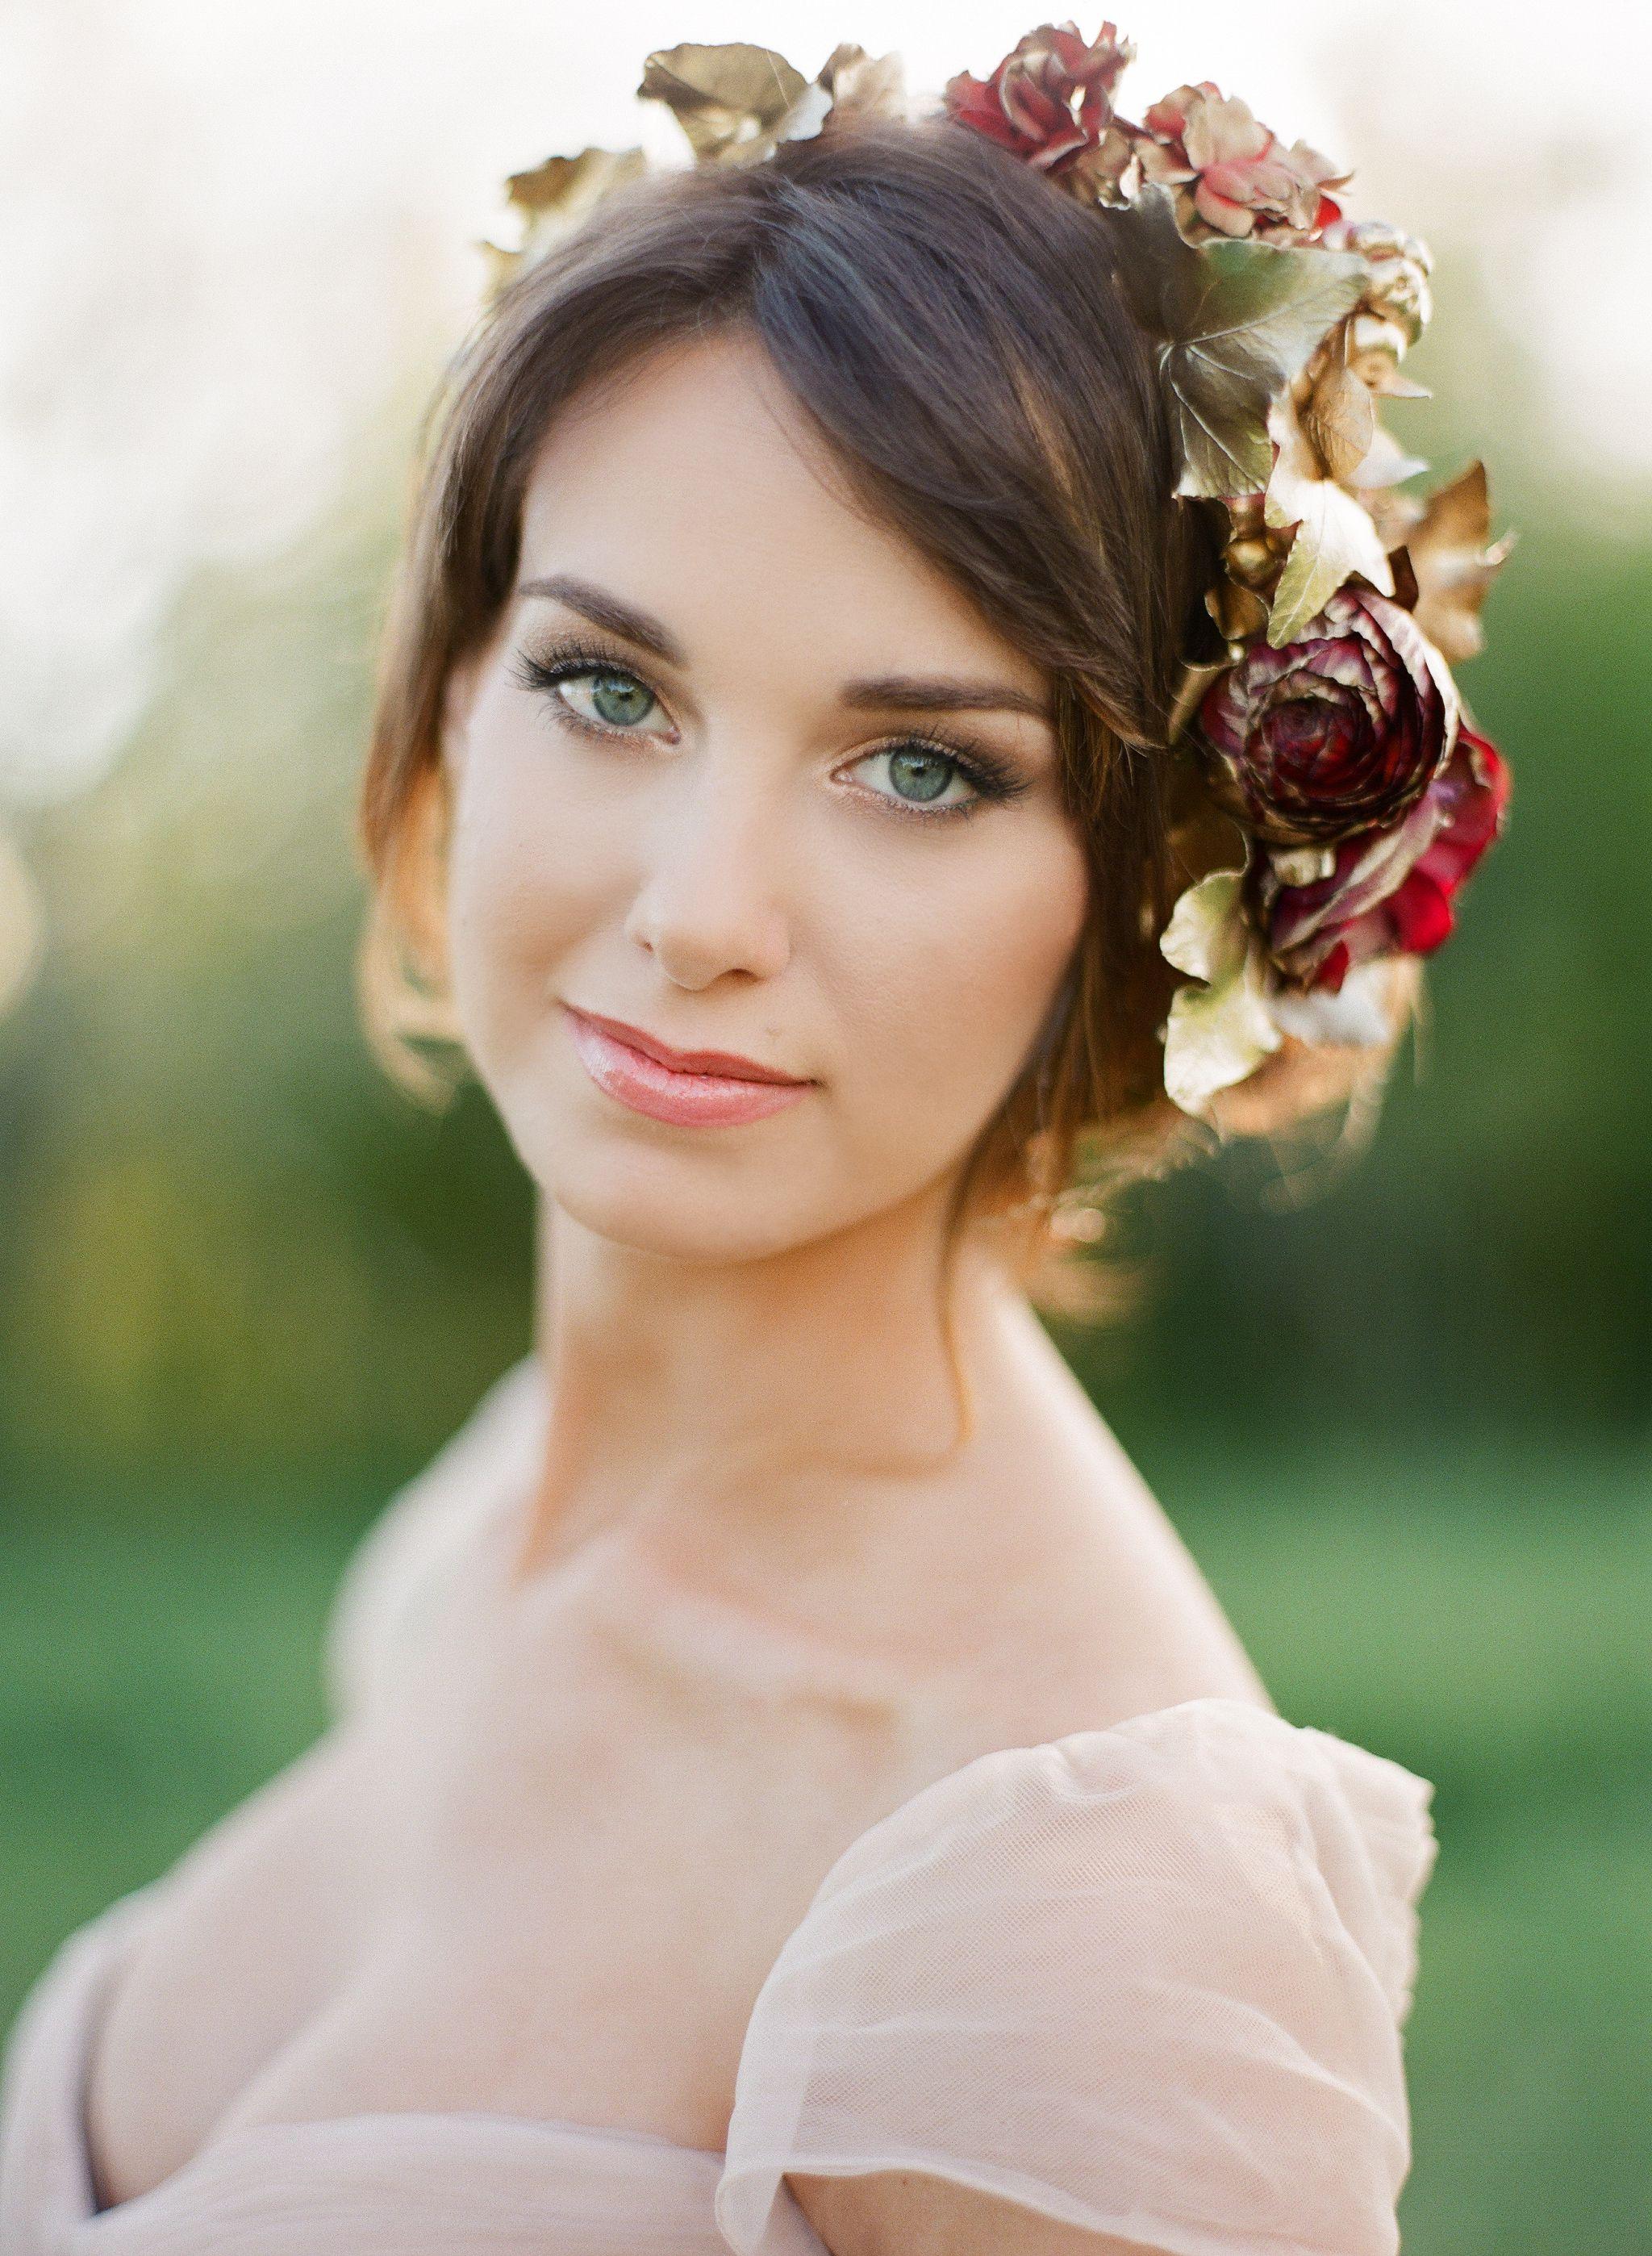 Bridal Fresh and bright Glamorous wedding makeup